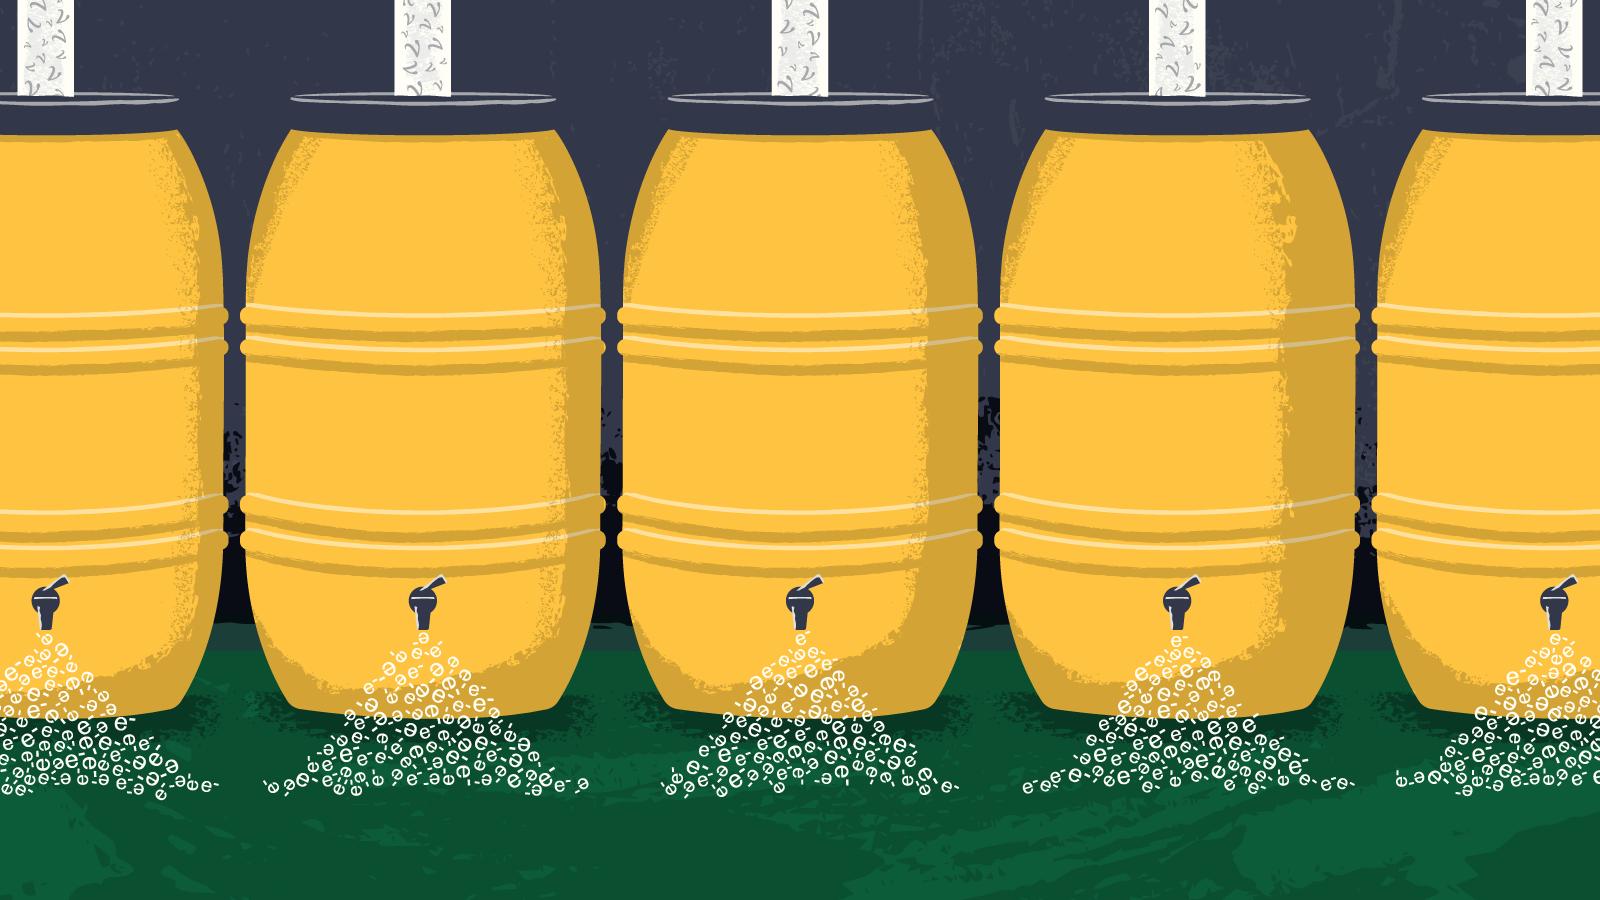 Illustration of rain barrels collecting particles